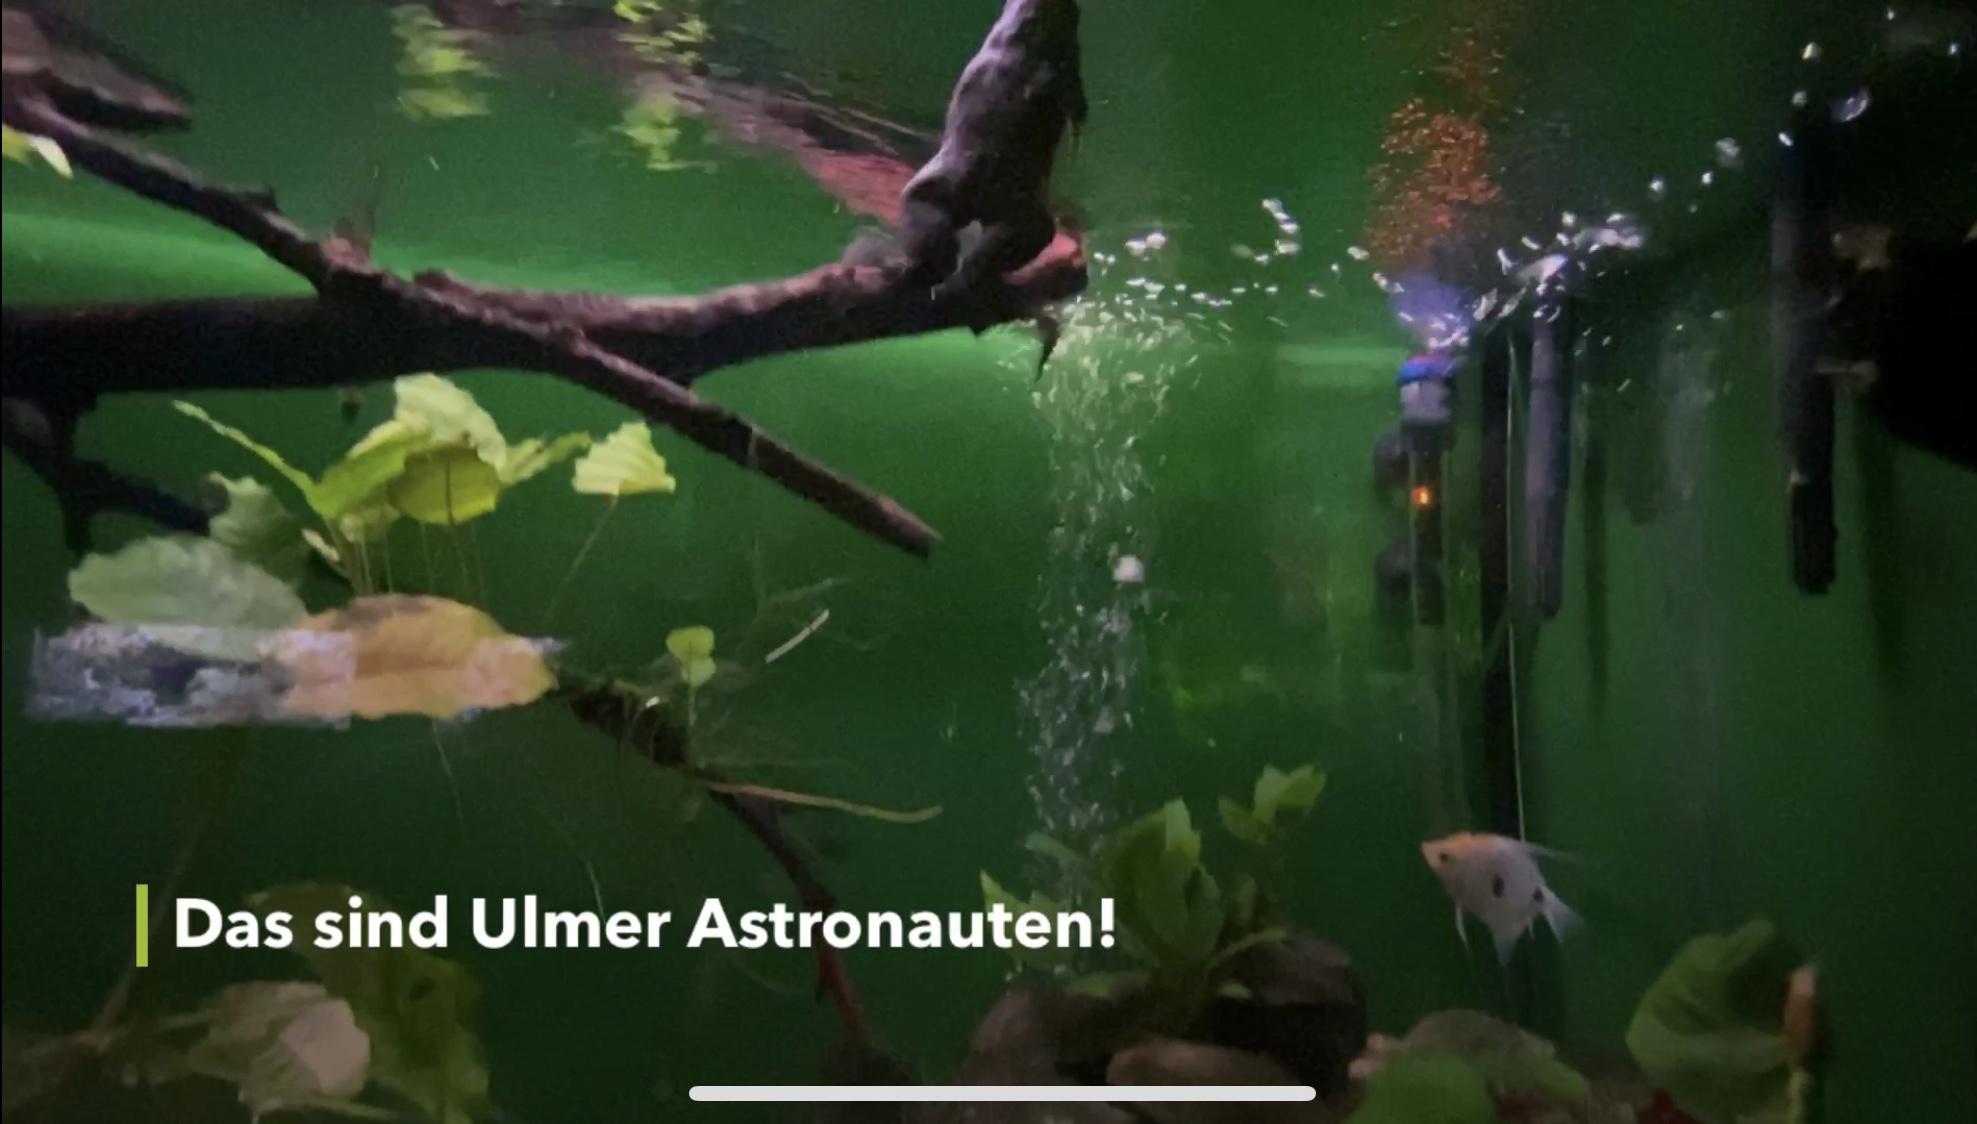 Ulmer Astronauten